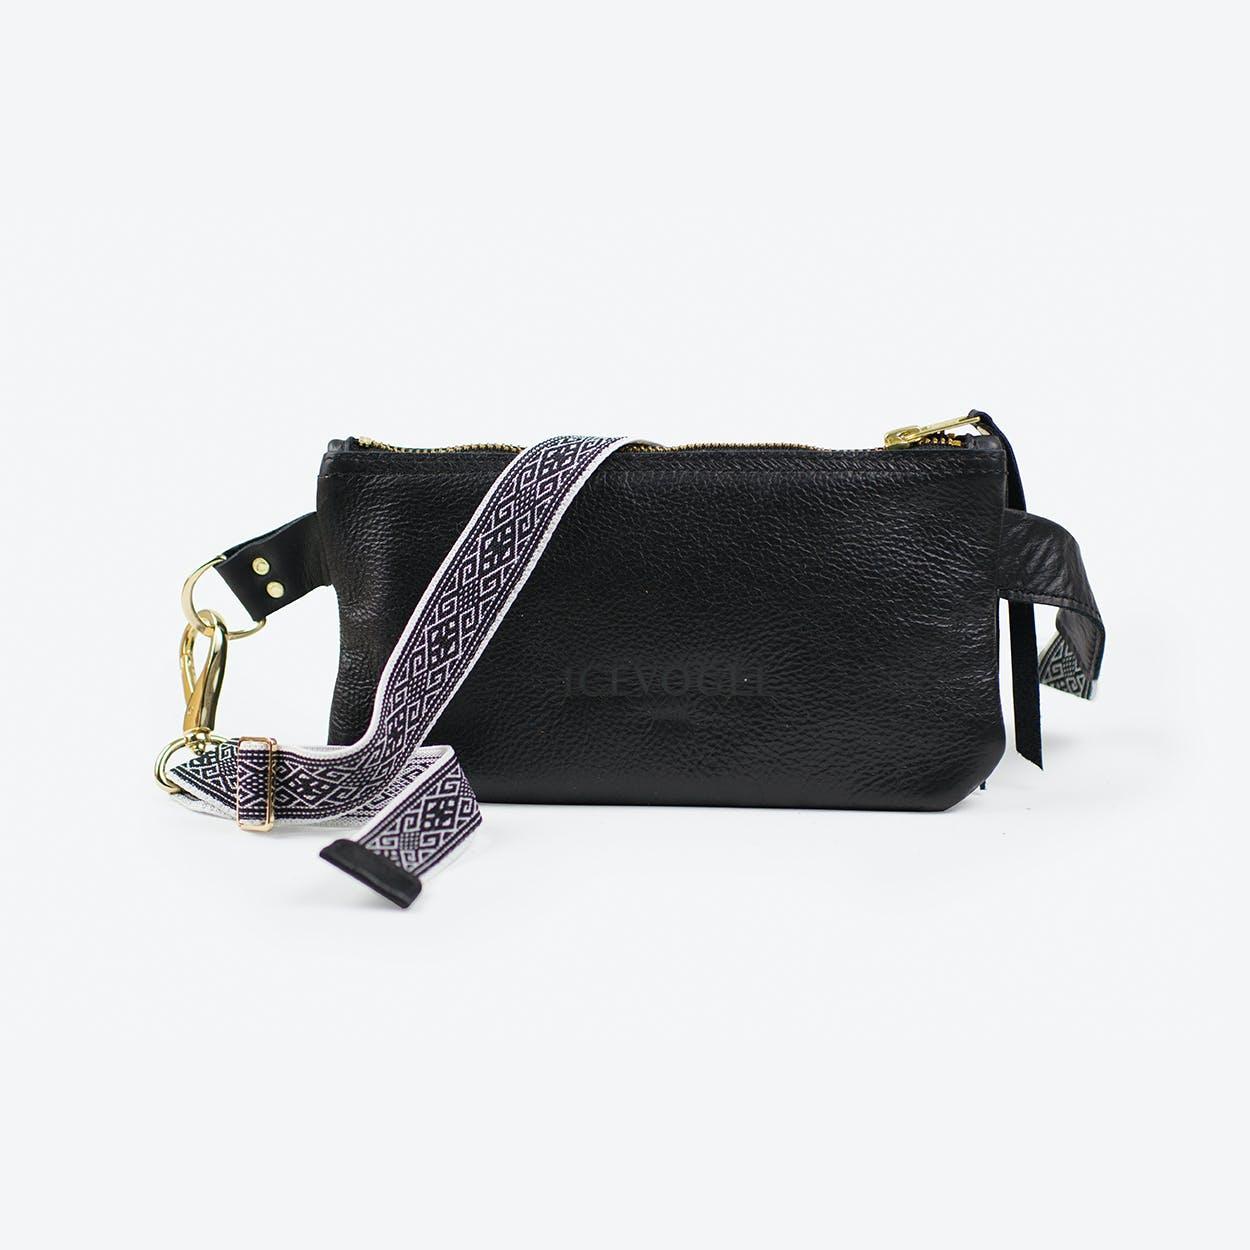 Hipbag Saatkrähe 1 in Black Cow Leather and Bohemian Strap